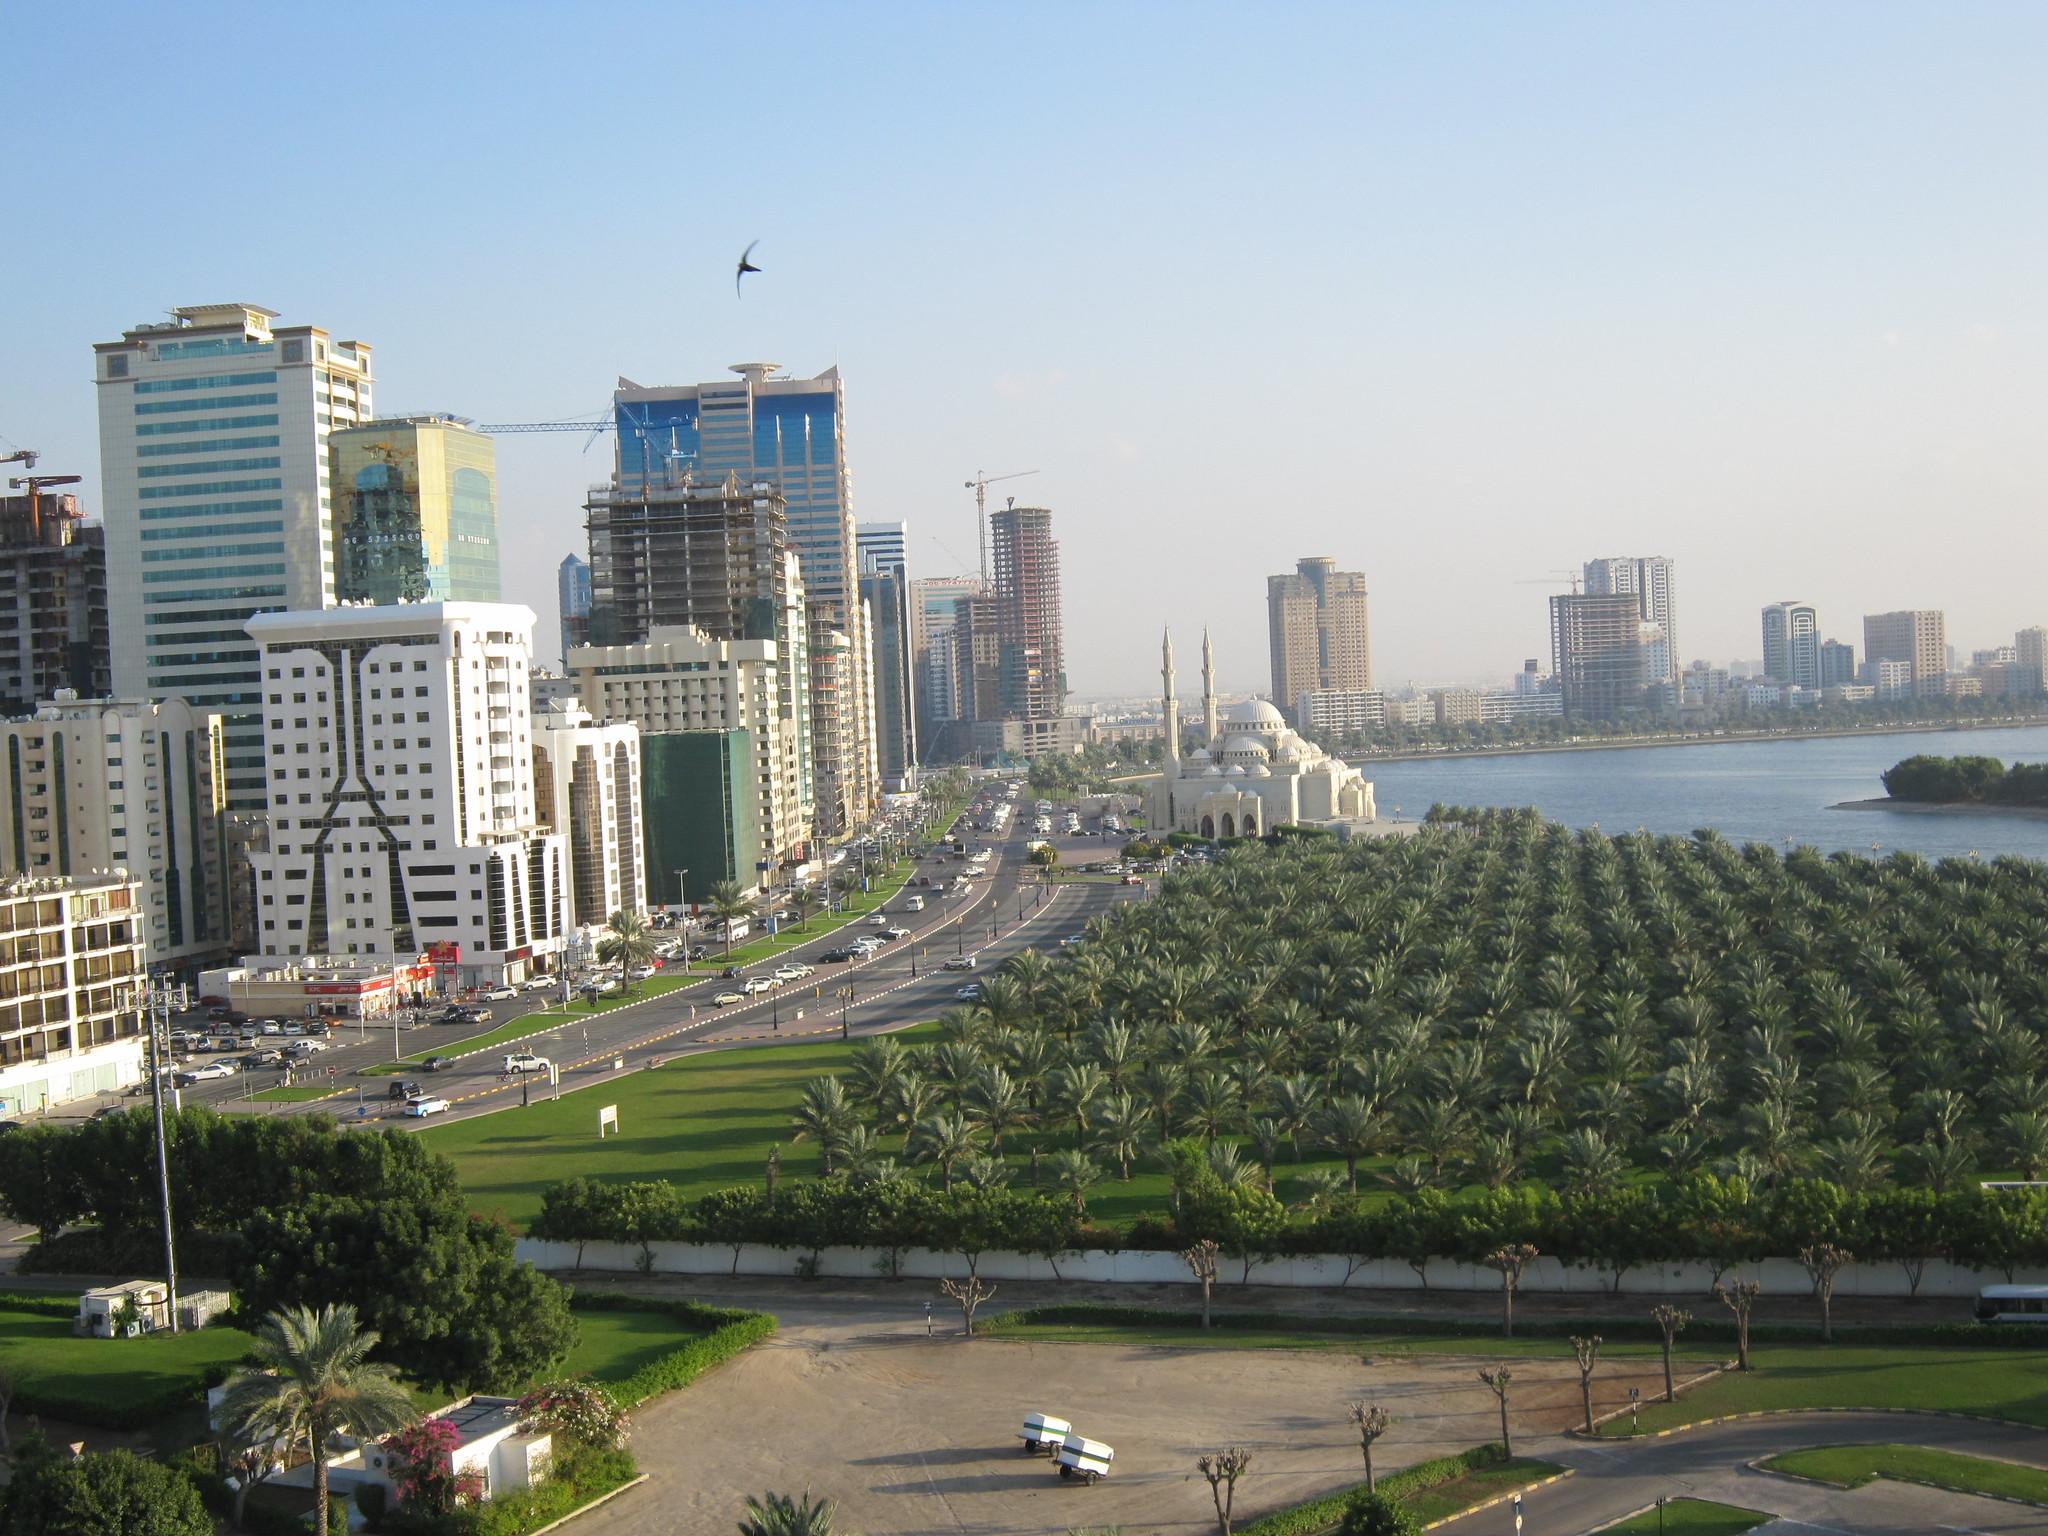 Sharjah Photo courtesy: Susanne Nilsson